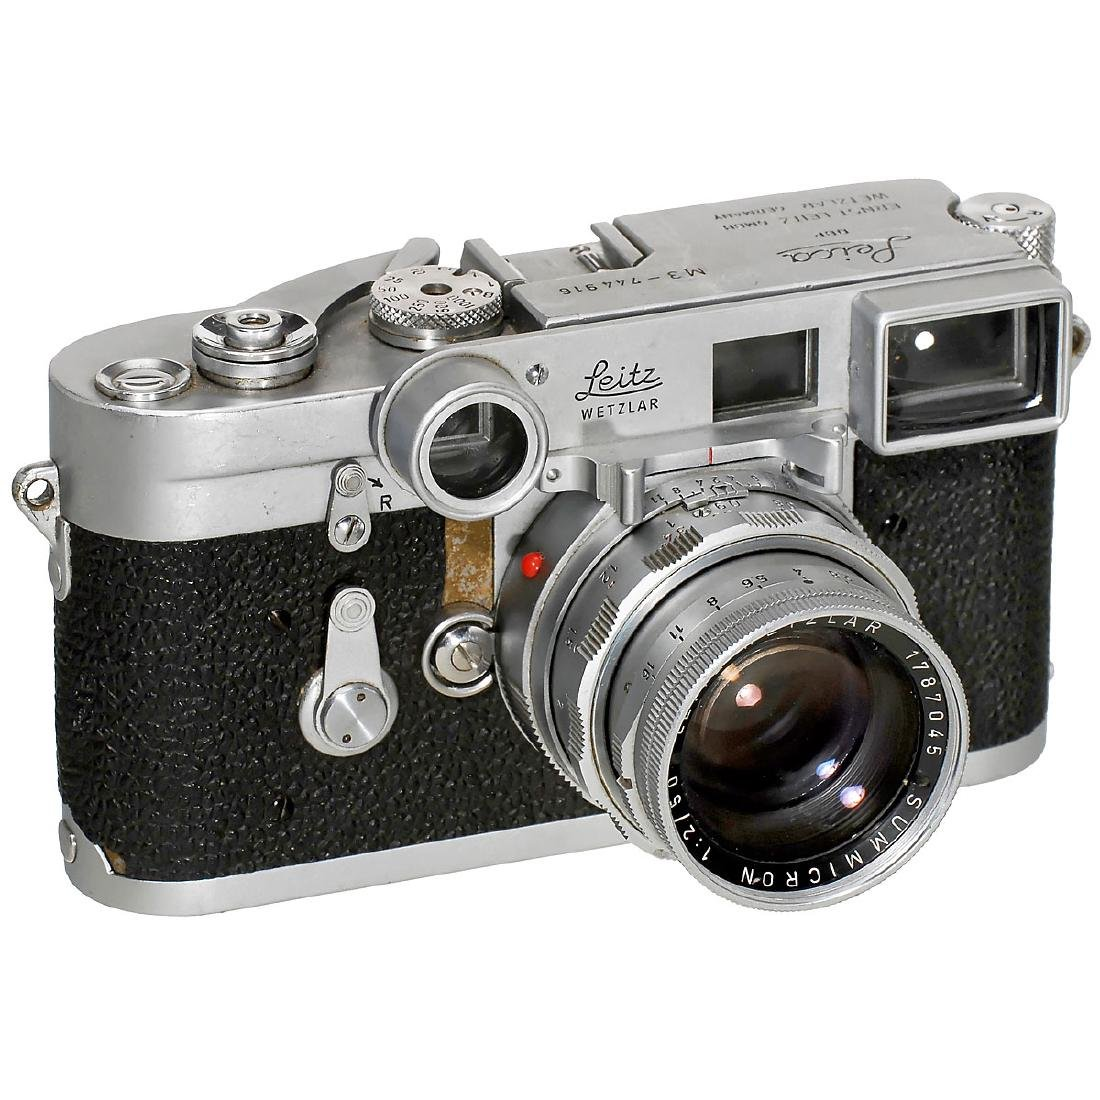 Leica M3 with Close-Range Summicron, 1955